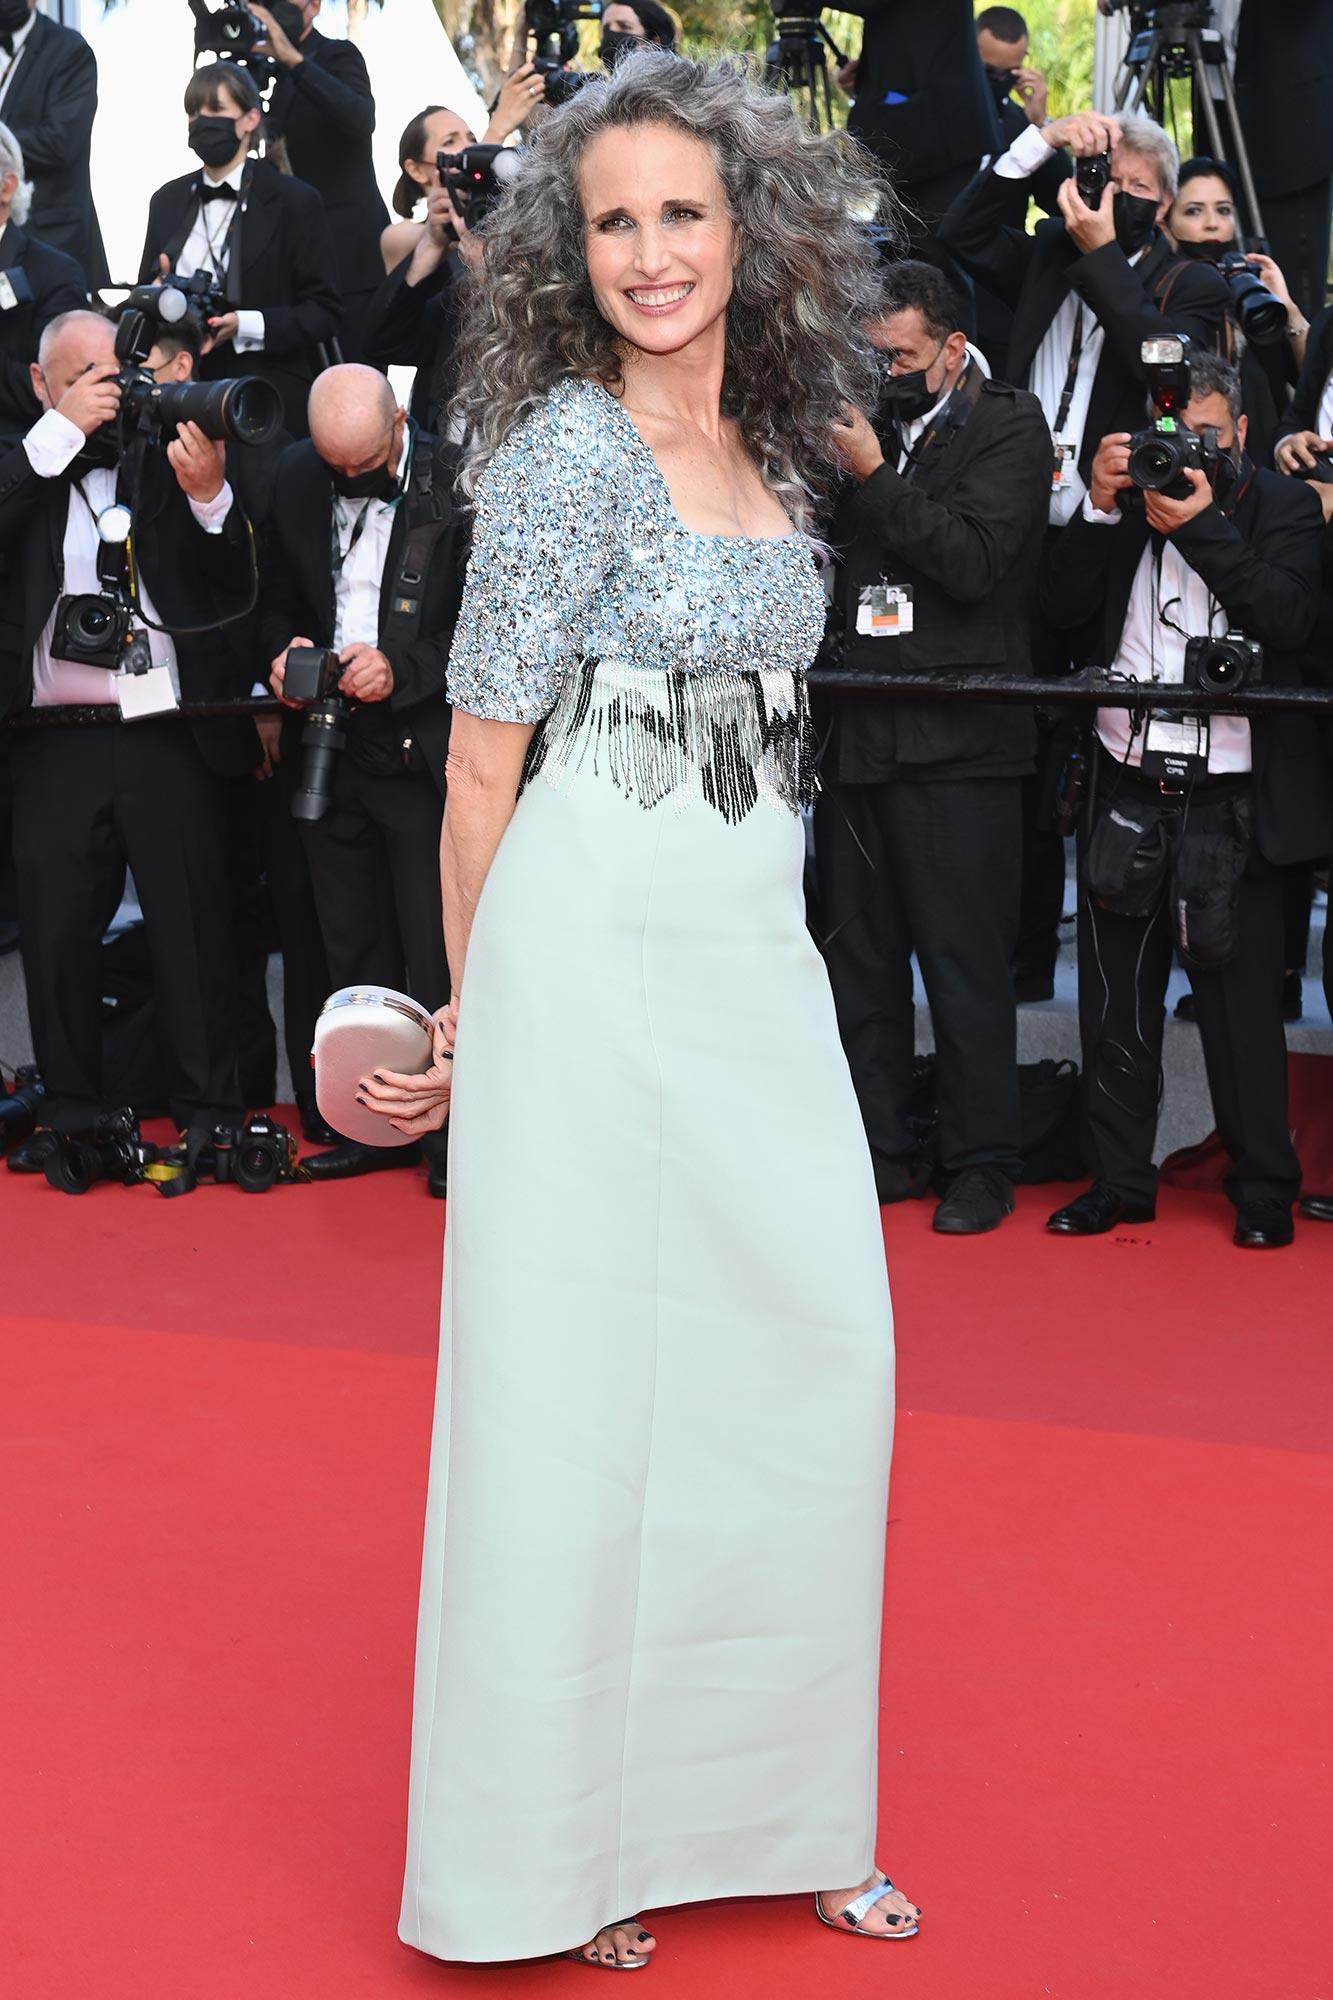 Cannes 2021 Red Carpet - Andie MacDowell